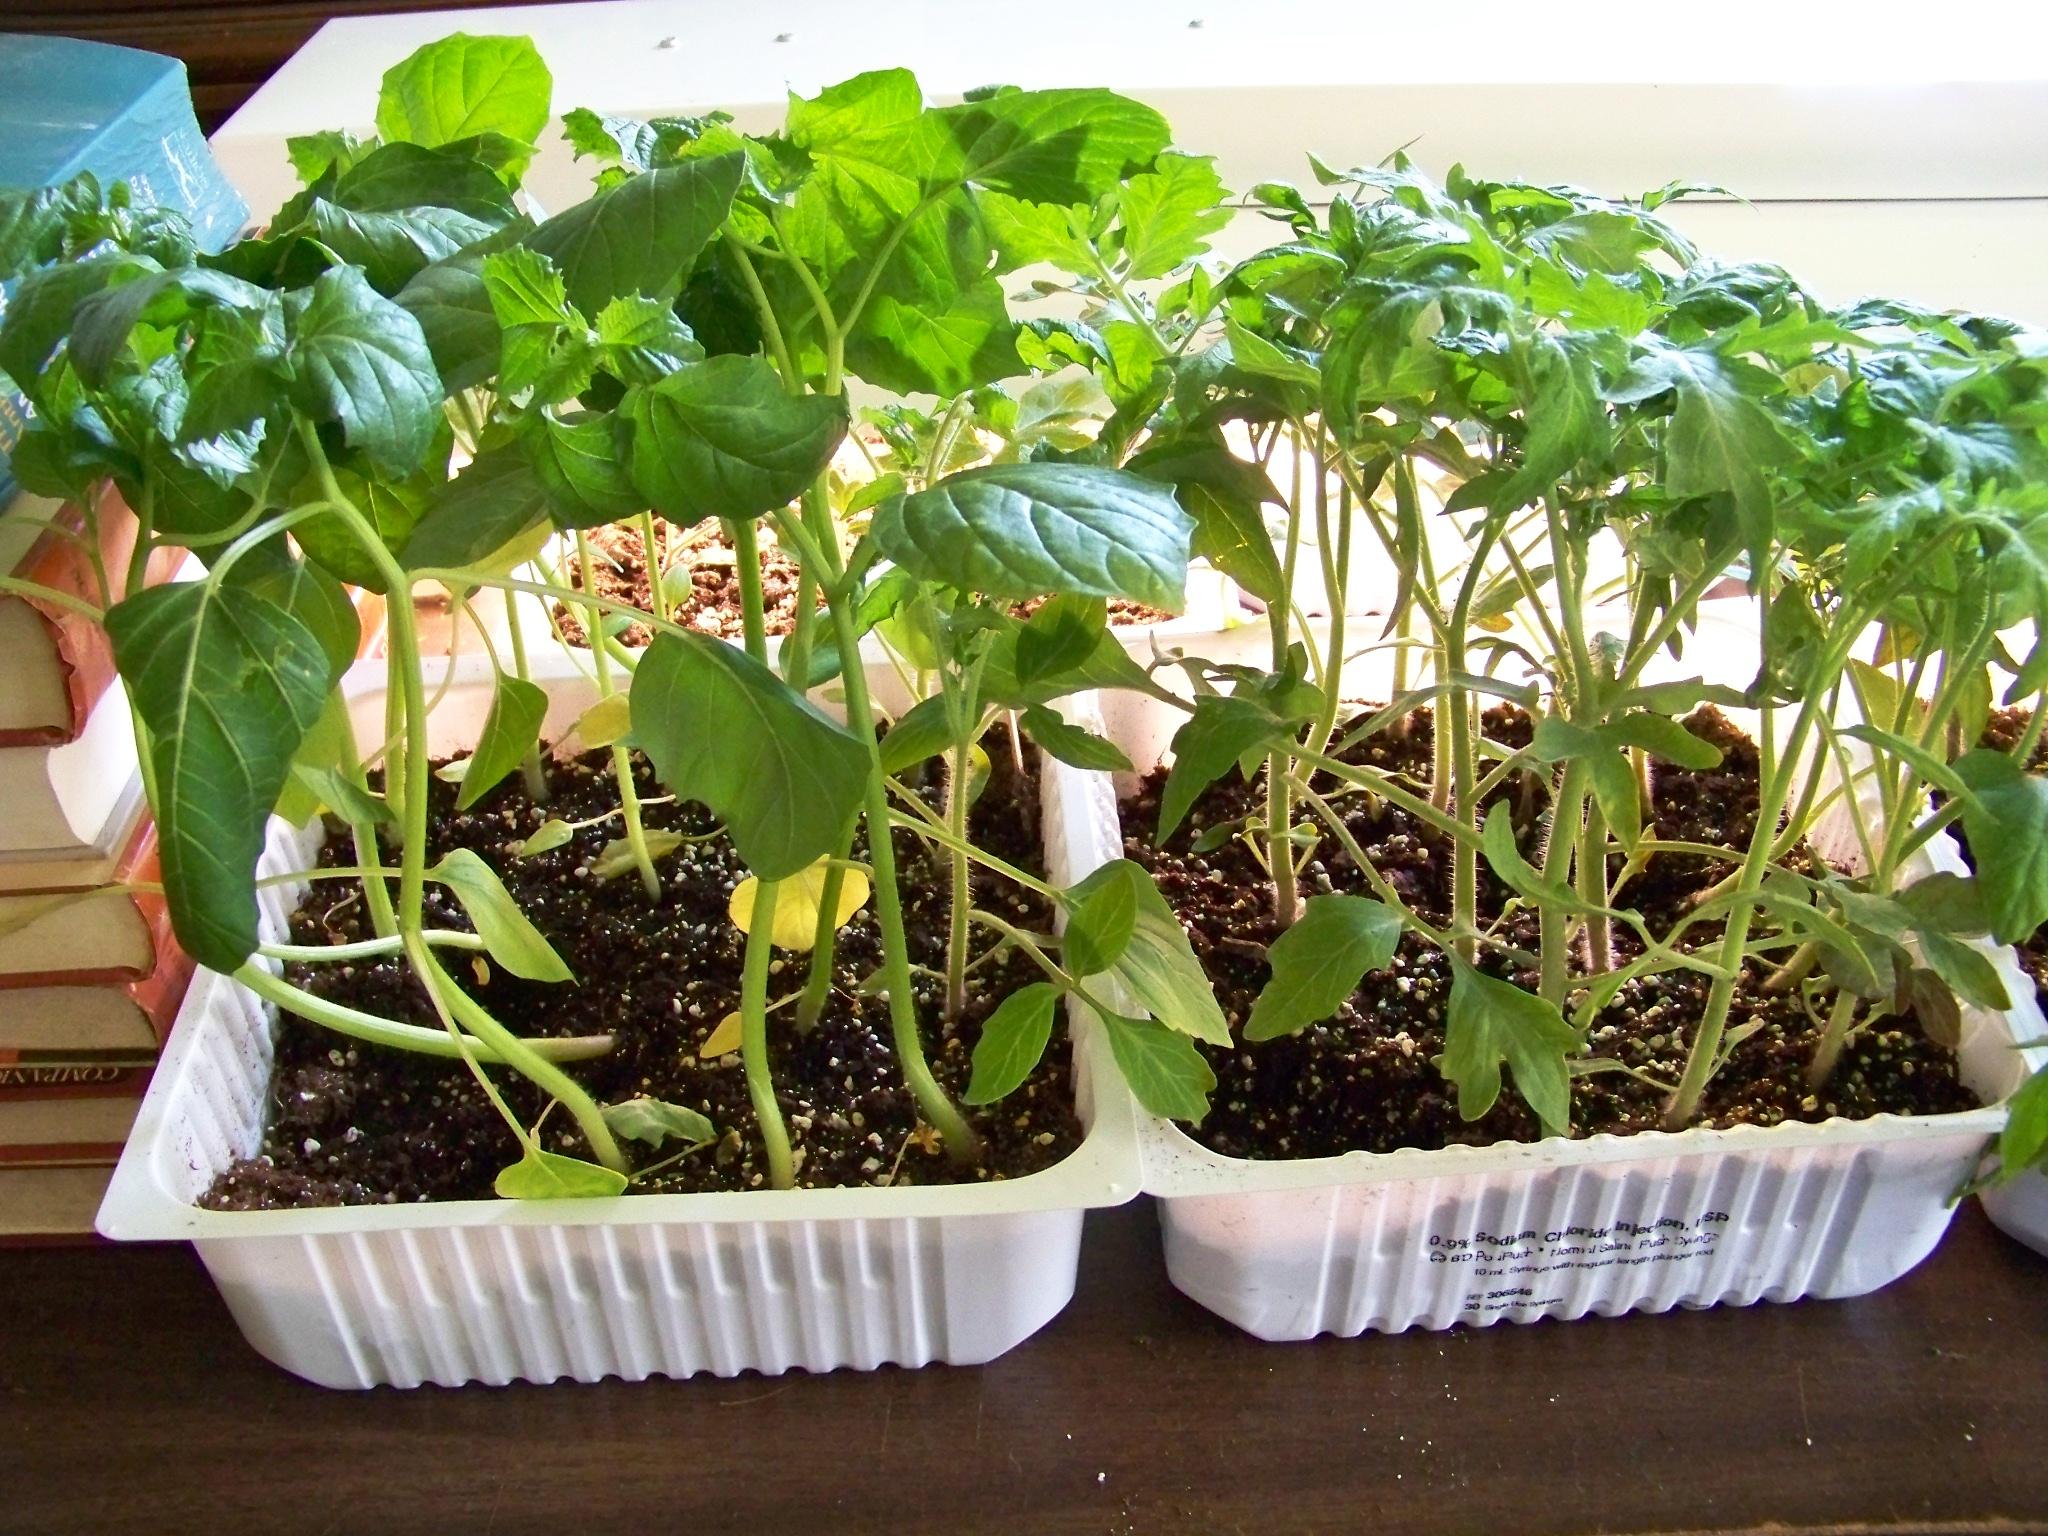 Gardening Series #8 Hardening Off